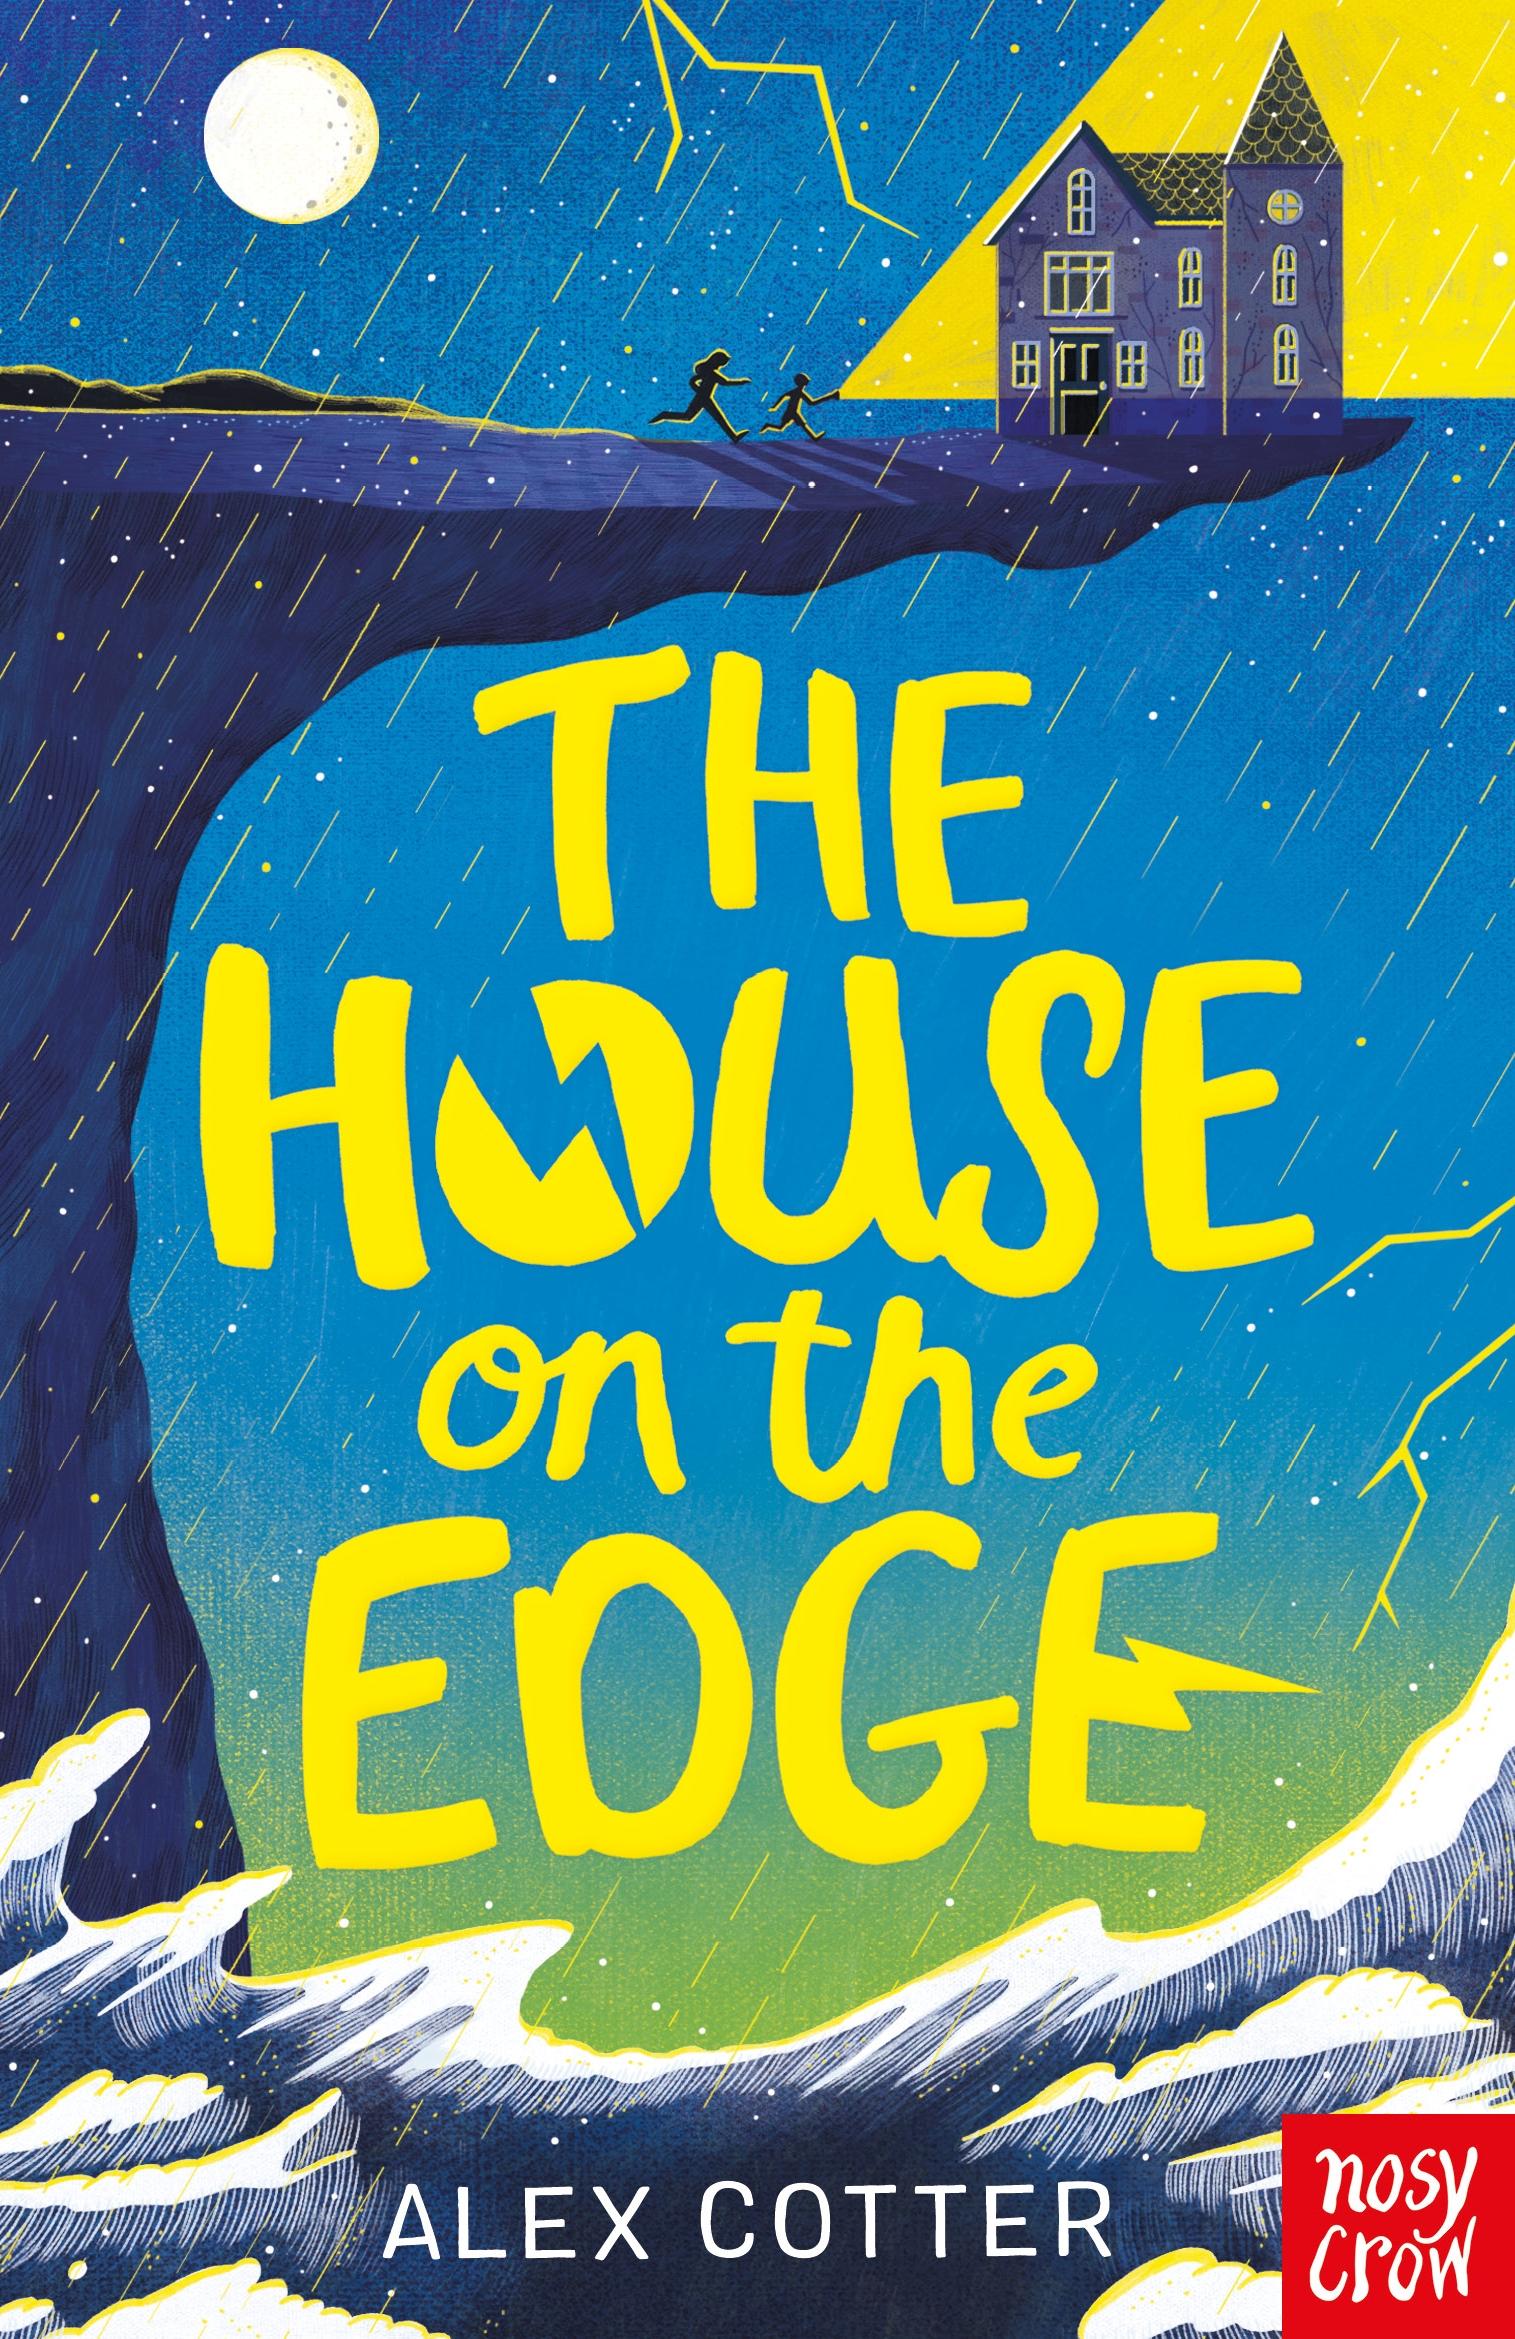 The House on the Edge - Nosy Crow